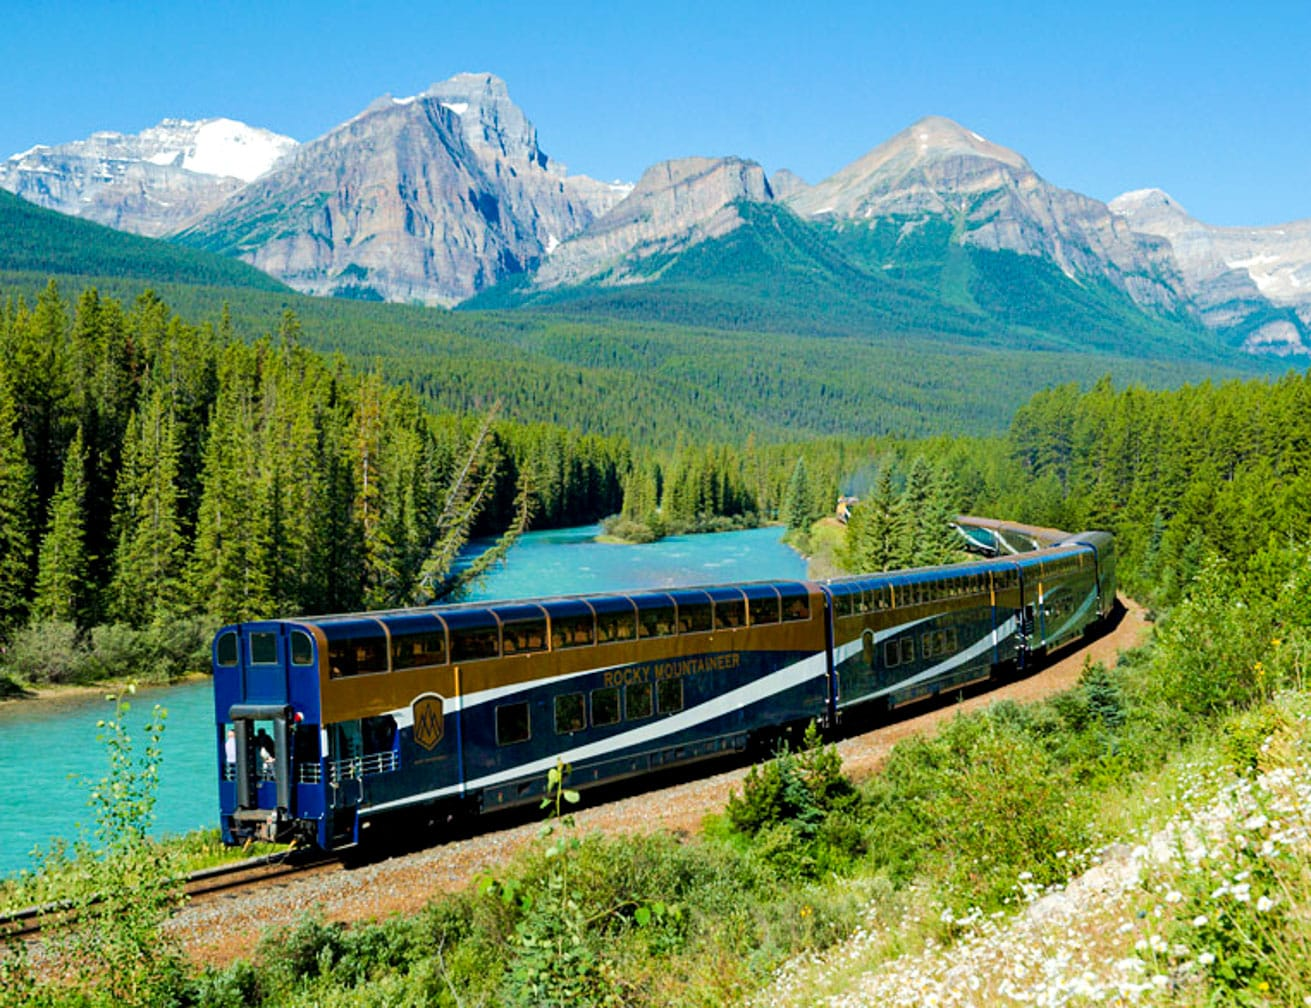 Train going through mountains on the Trans-Canada Rail Adventure: Vancouver-Toronto journey